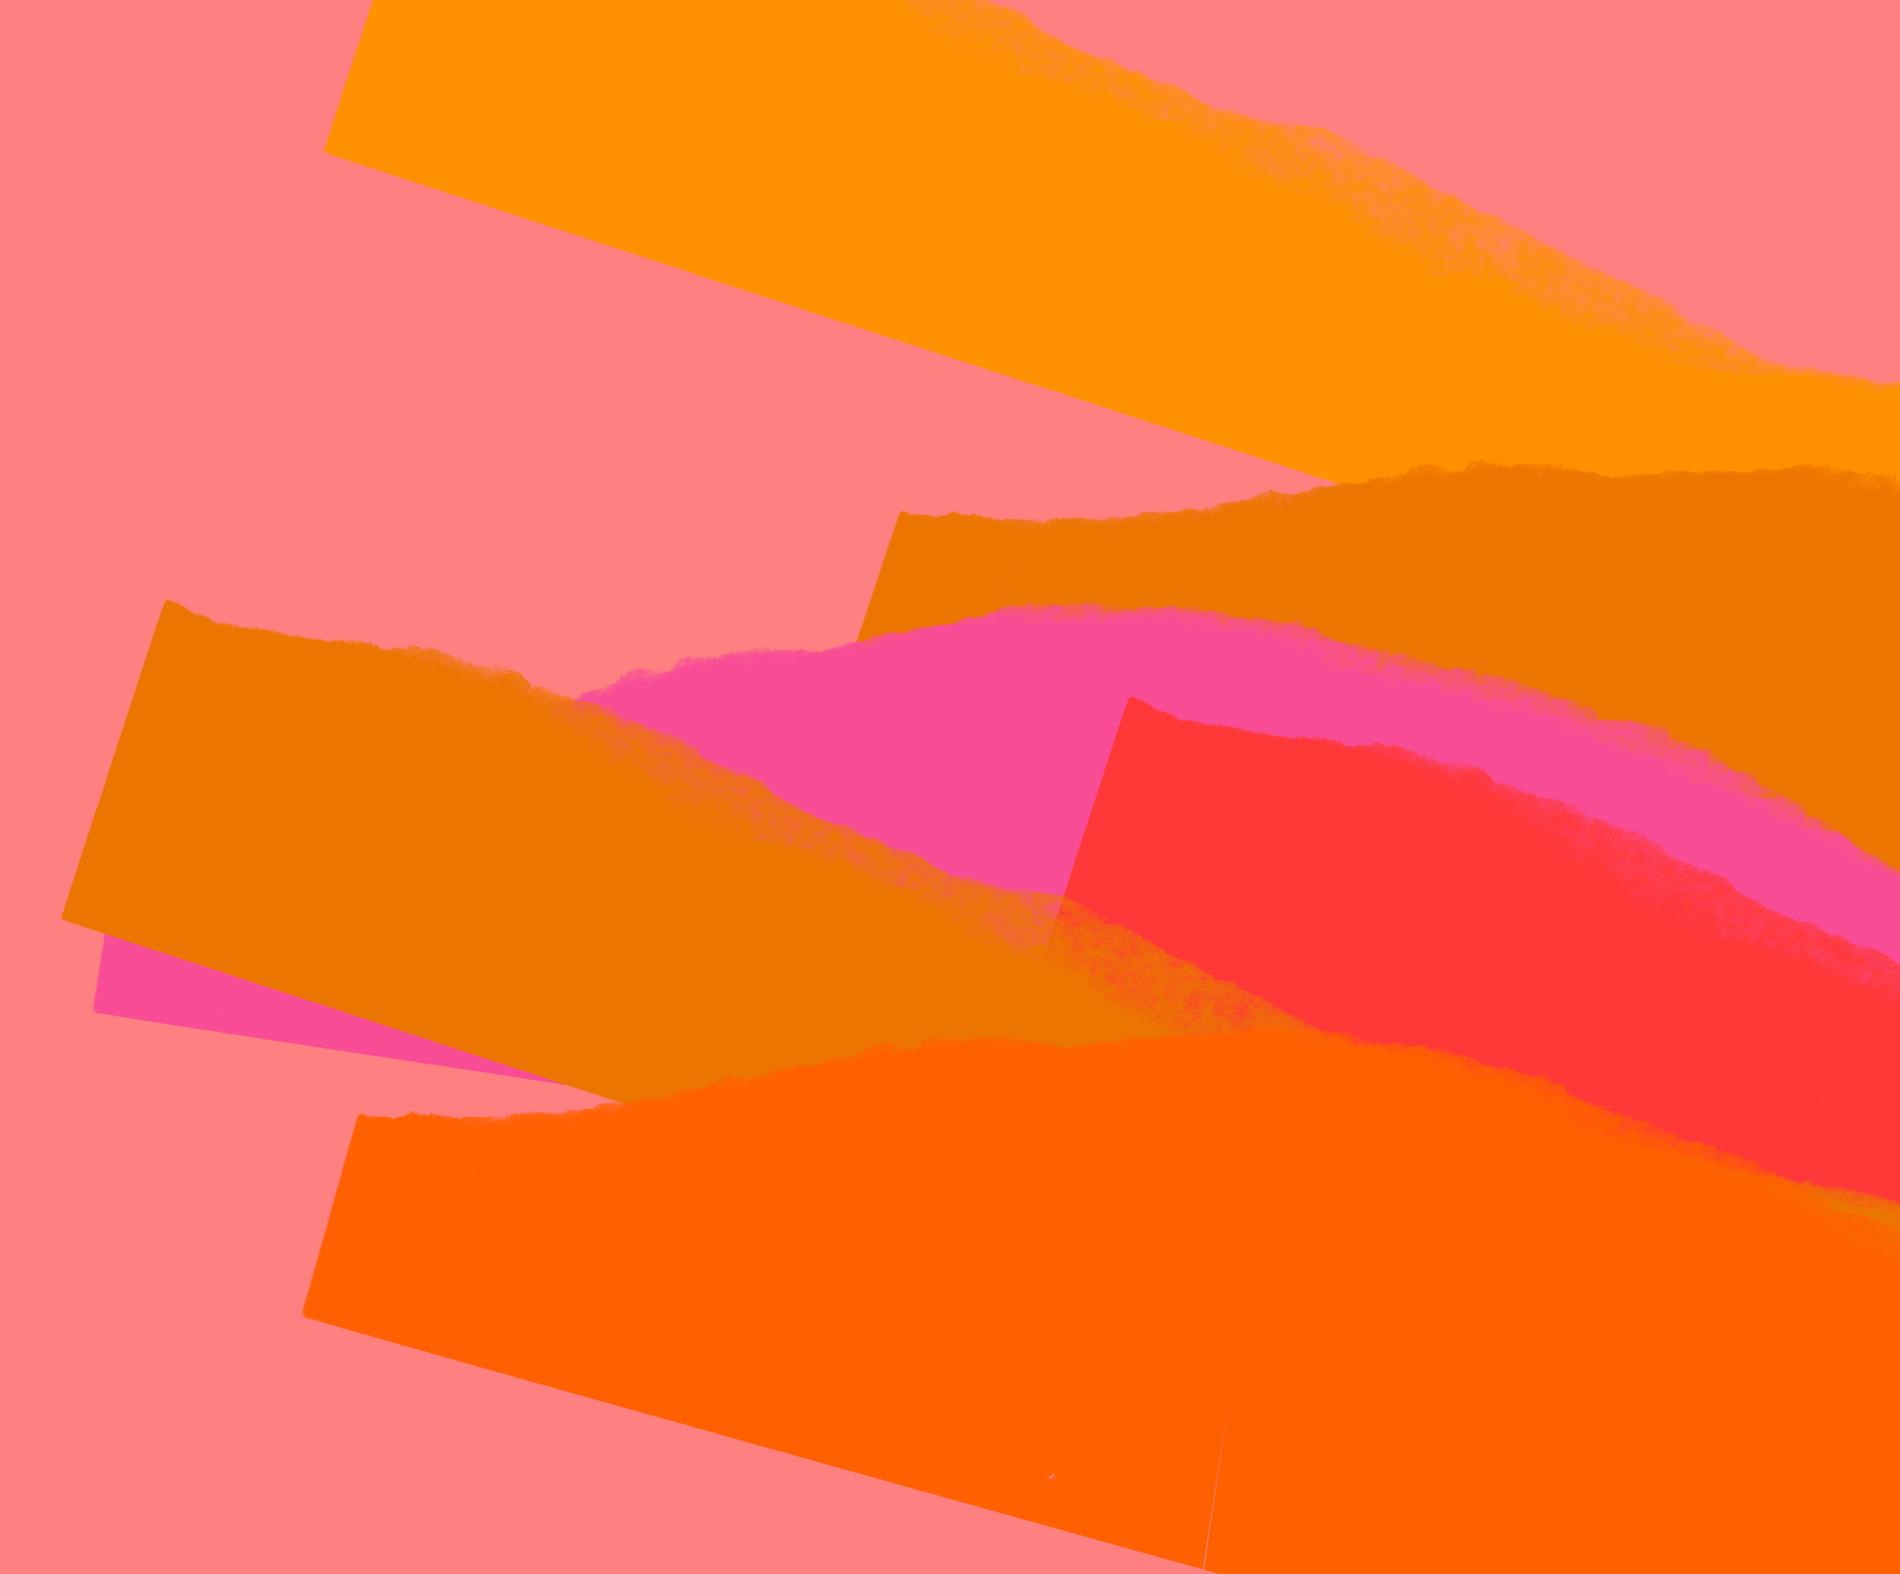 colours-by-Natasha-Durley.jpg